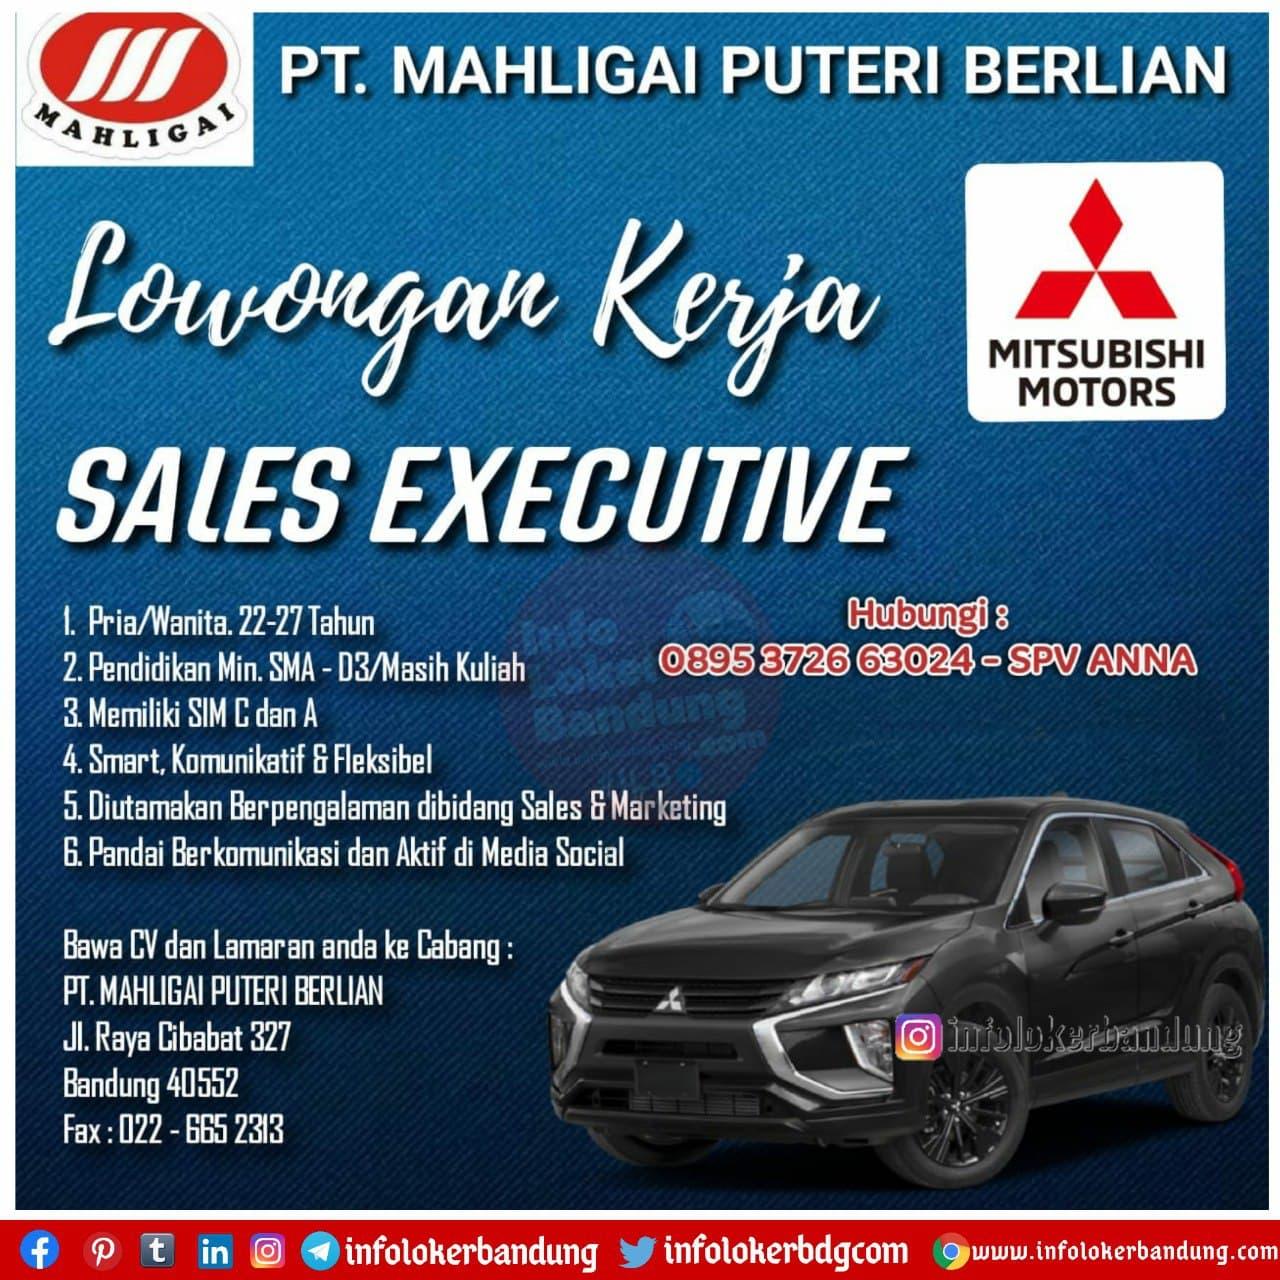 Lowongan Kerja PT. Mahligai Puteri Berlian ( Mitsubishi Motors ) Bandung Januari 2021